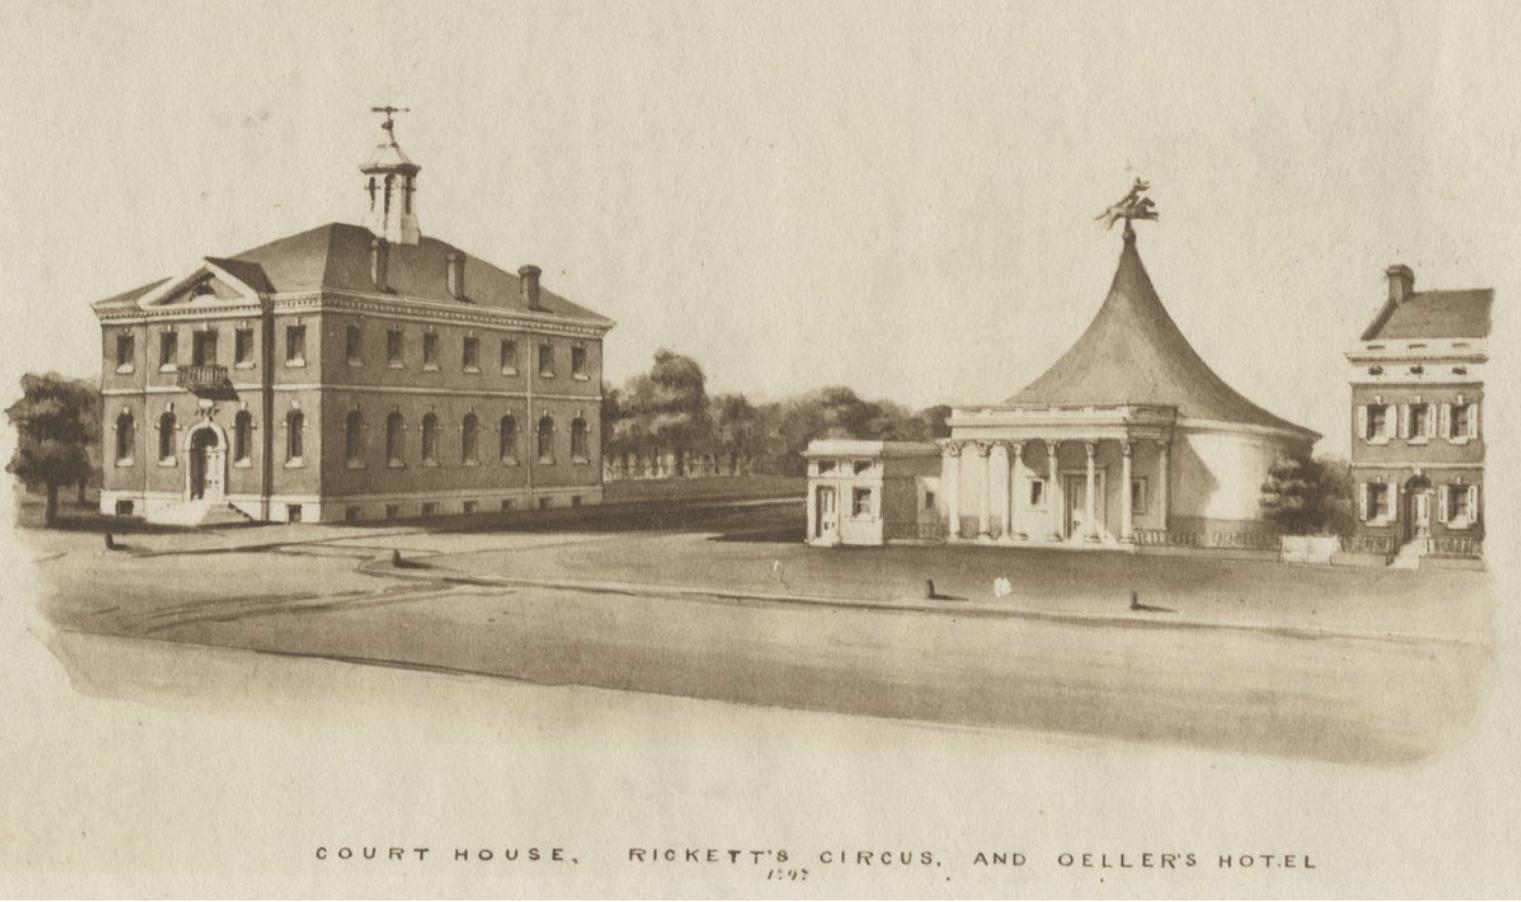 Ricketts Circus and Art Pantheon 1797